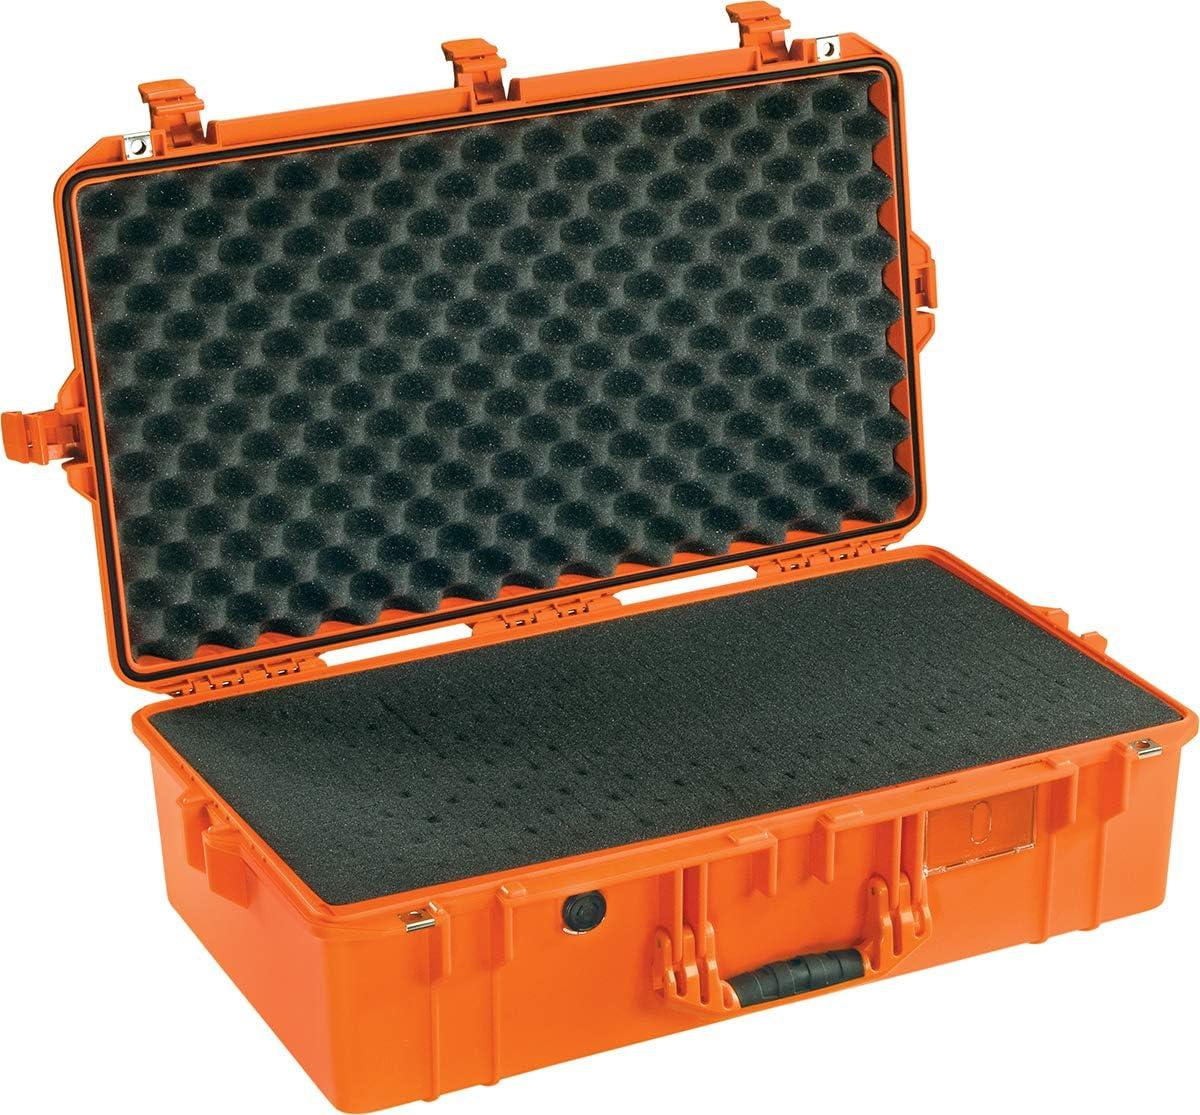 Black Pelican Air 1605 Case With Foam